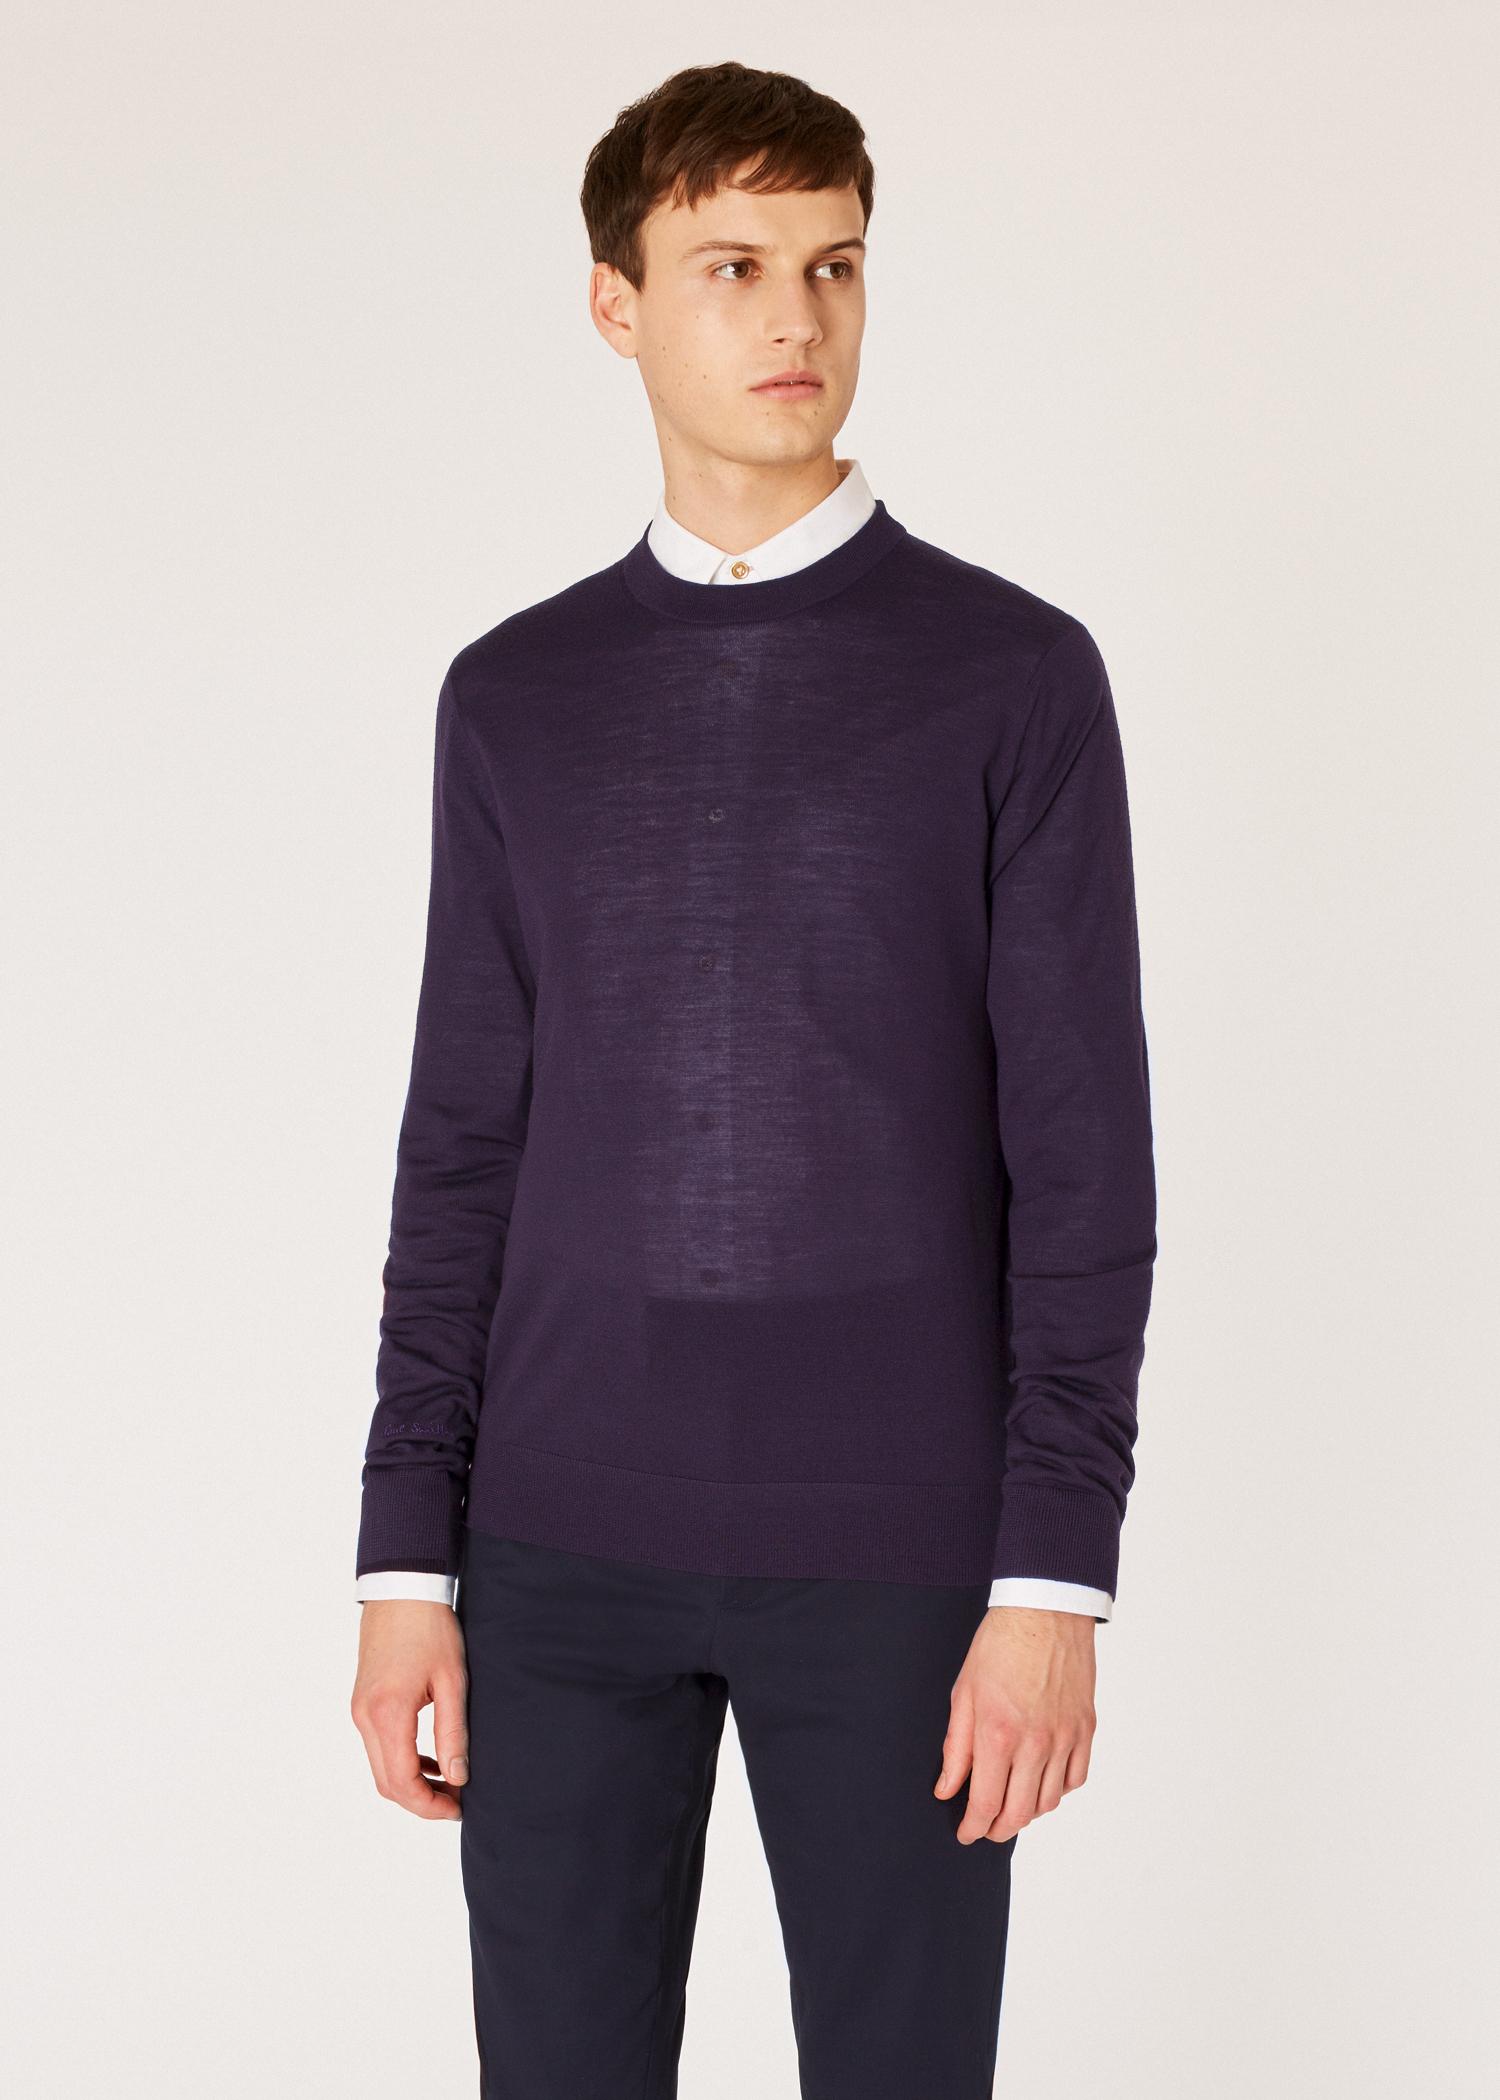 30efe39cd Model front clsoe up - Men's Aubergine Merino Wool Sweater Paul Smith